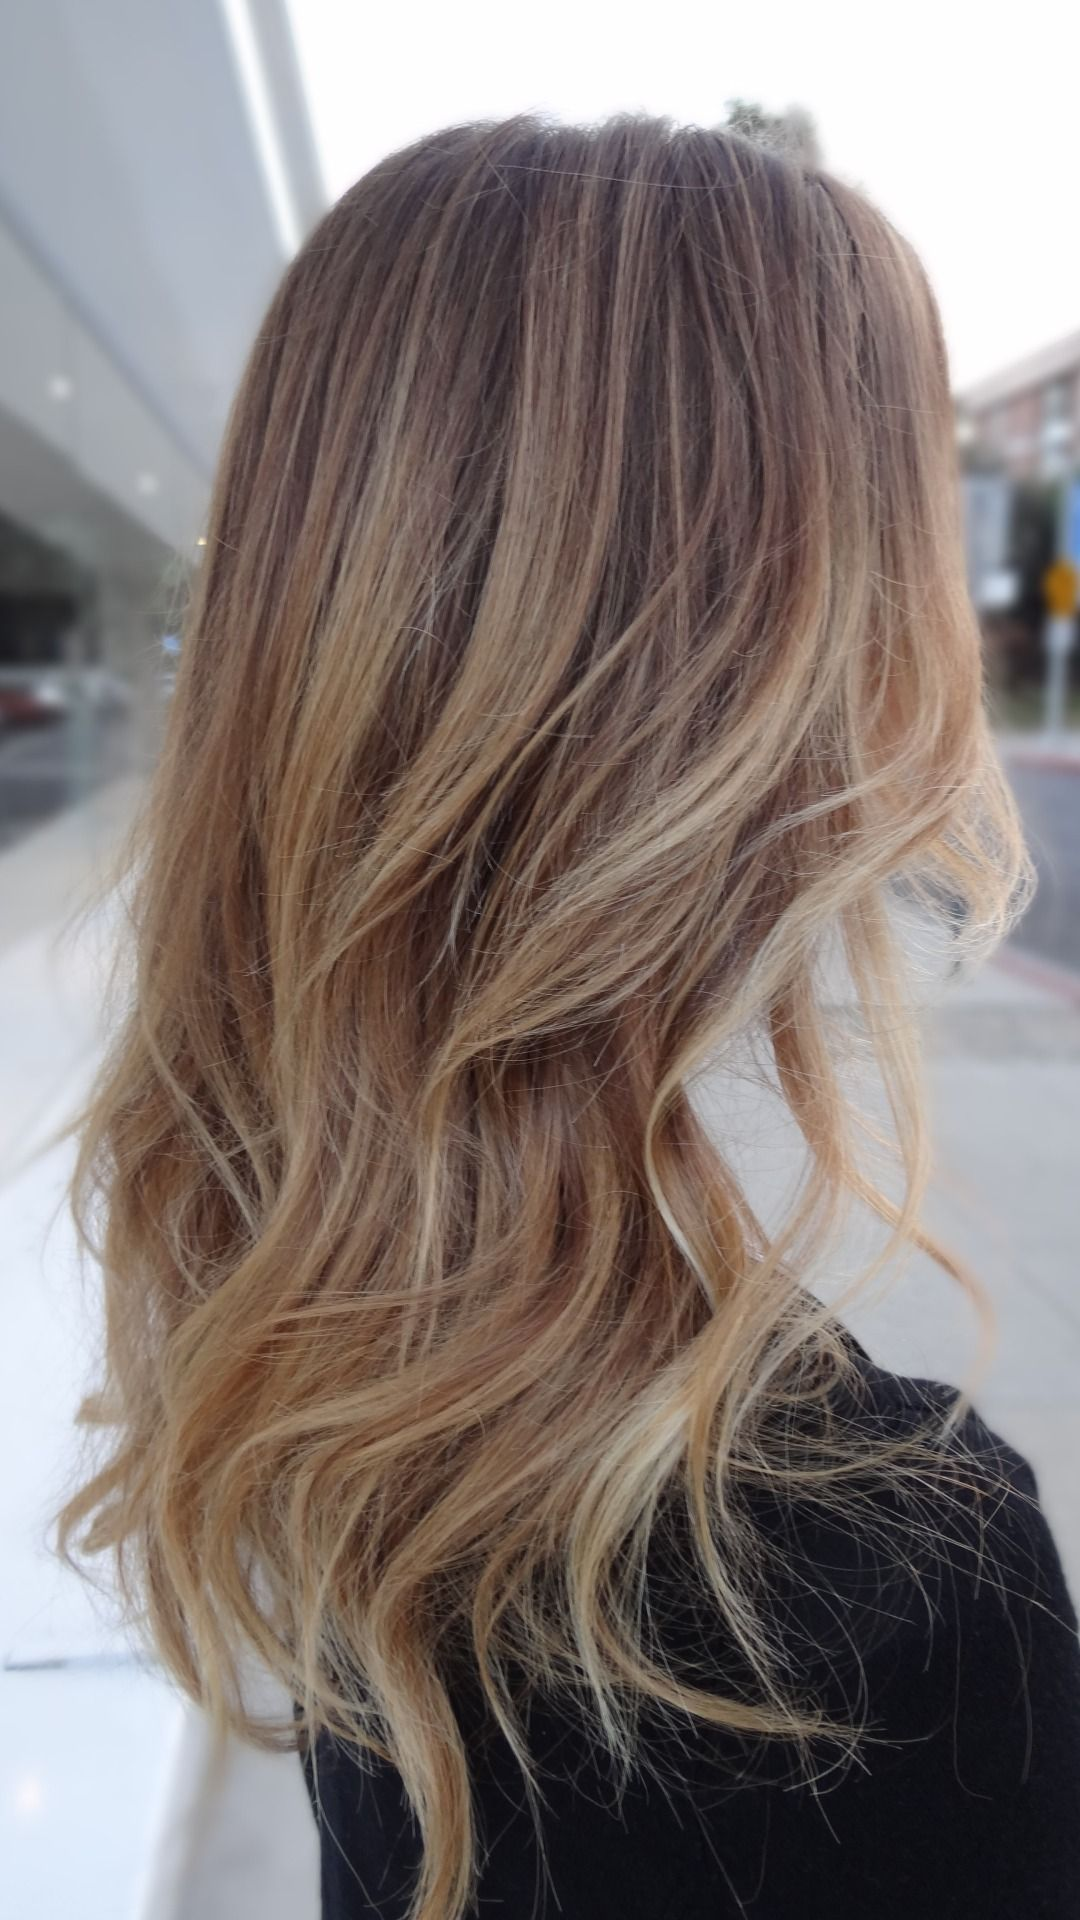 SANDY BEACHY BLONDE HAIR COLOR BY SARAH CONNER dirty blonde